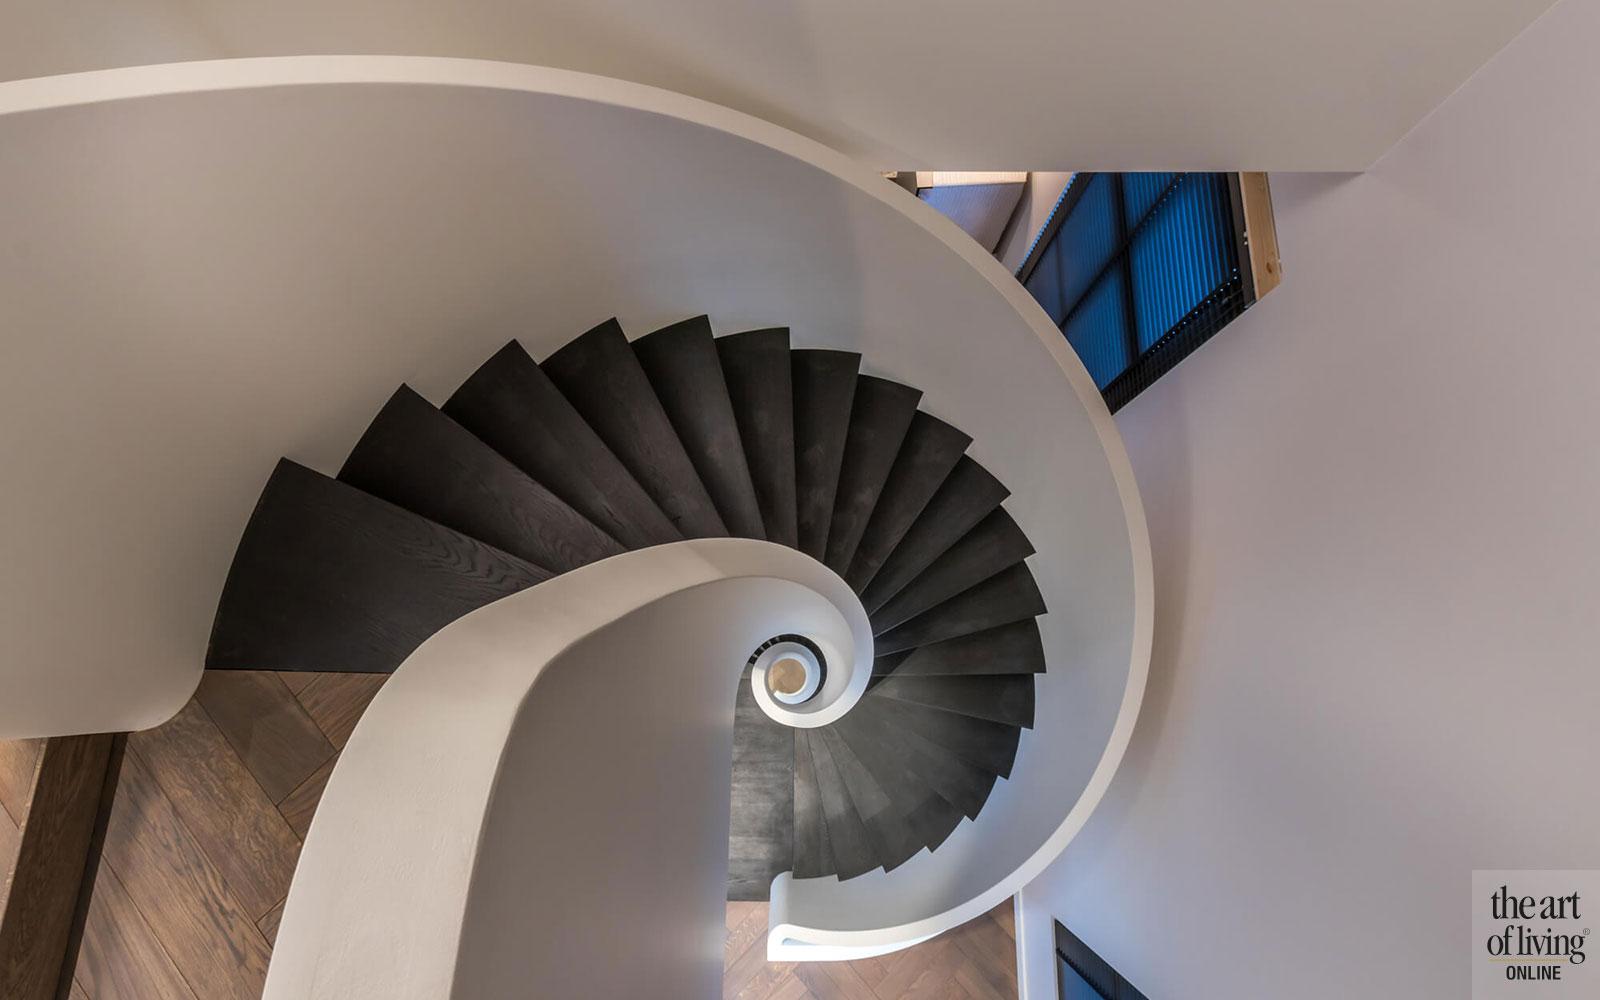 bijzondere trappen | Van Bruchem Staircase, the art of living